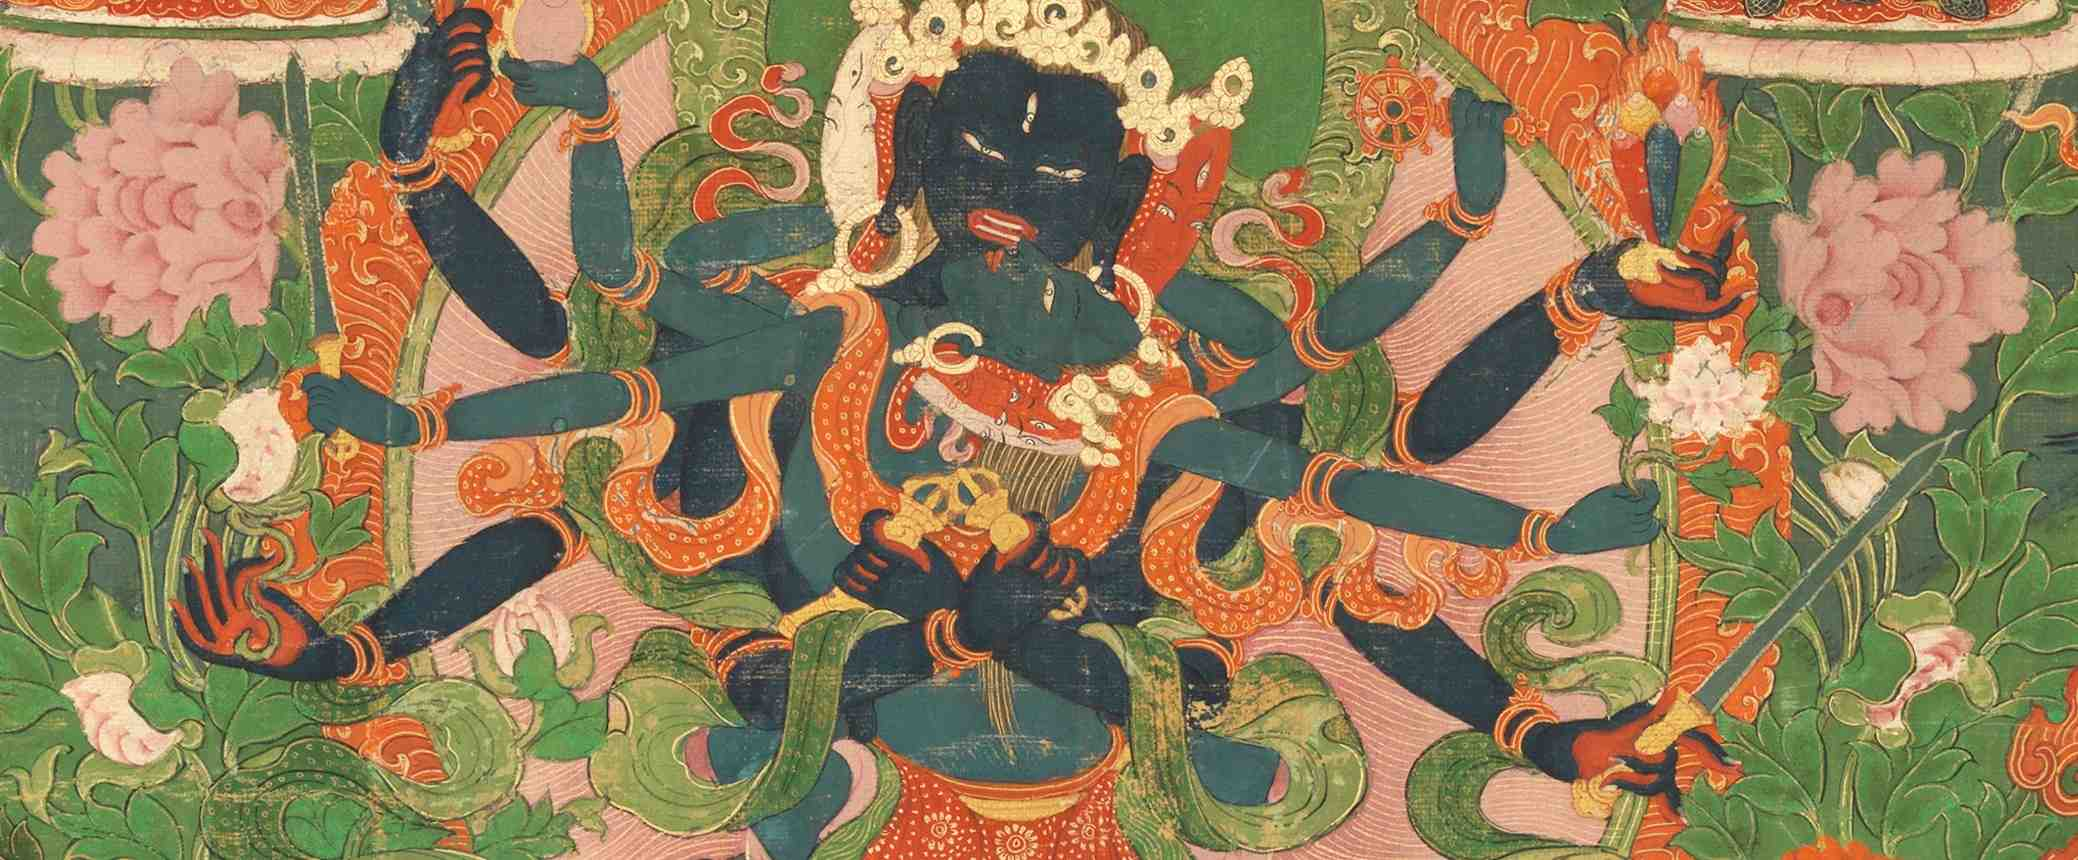 Secret world of tantra tourmaster